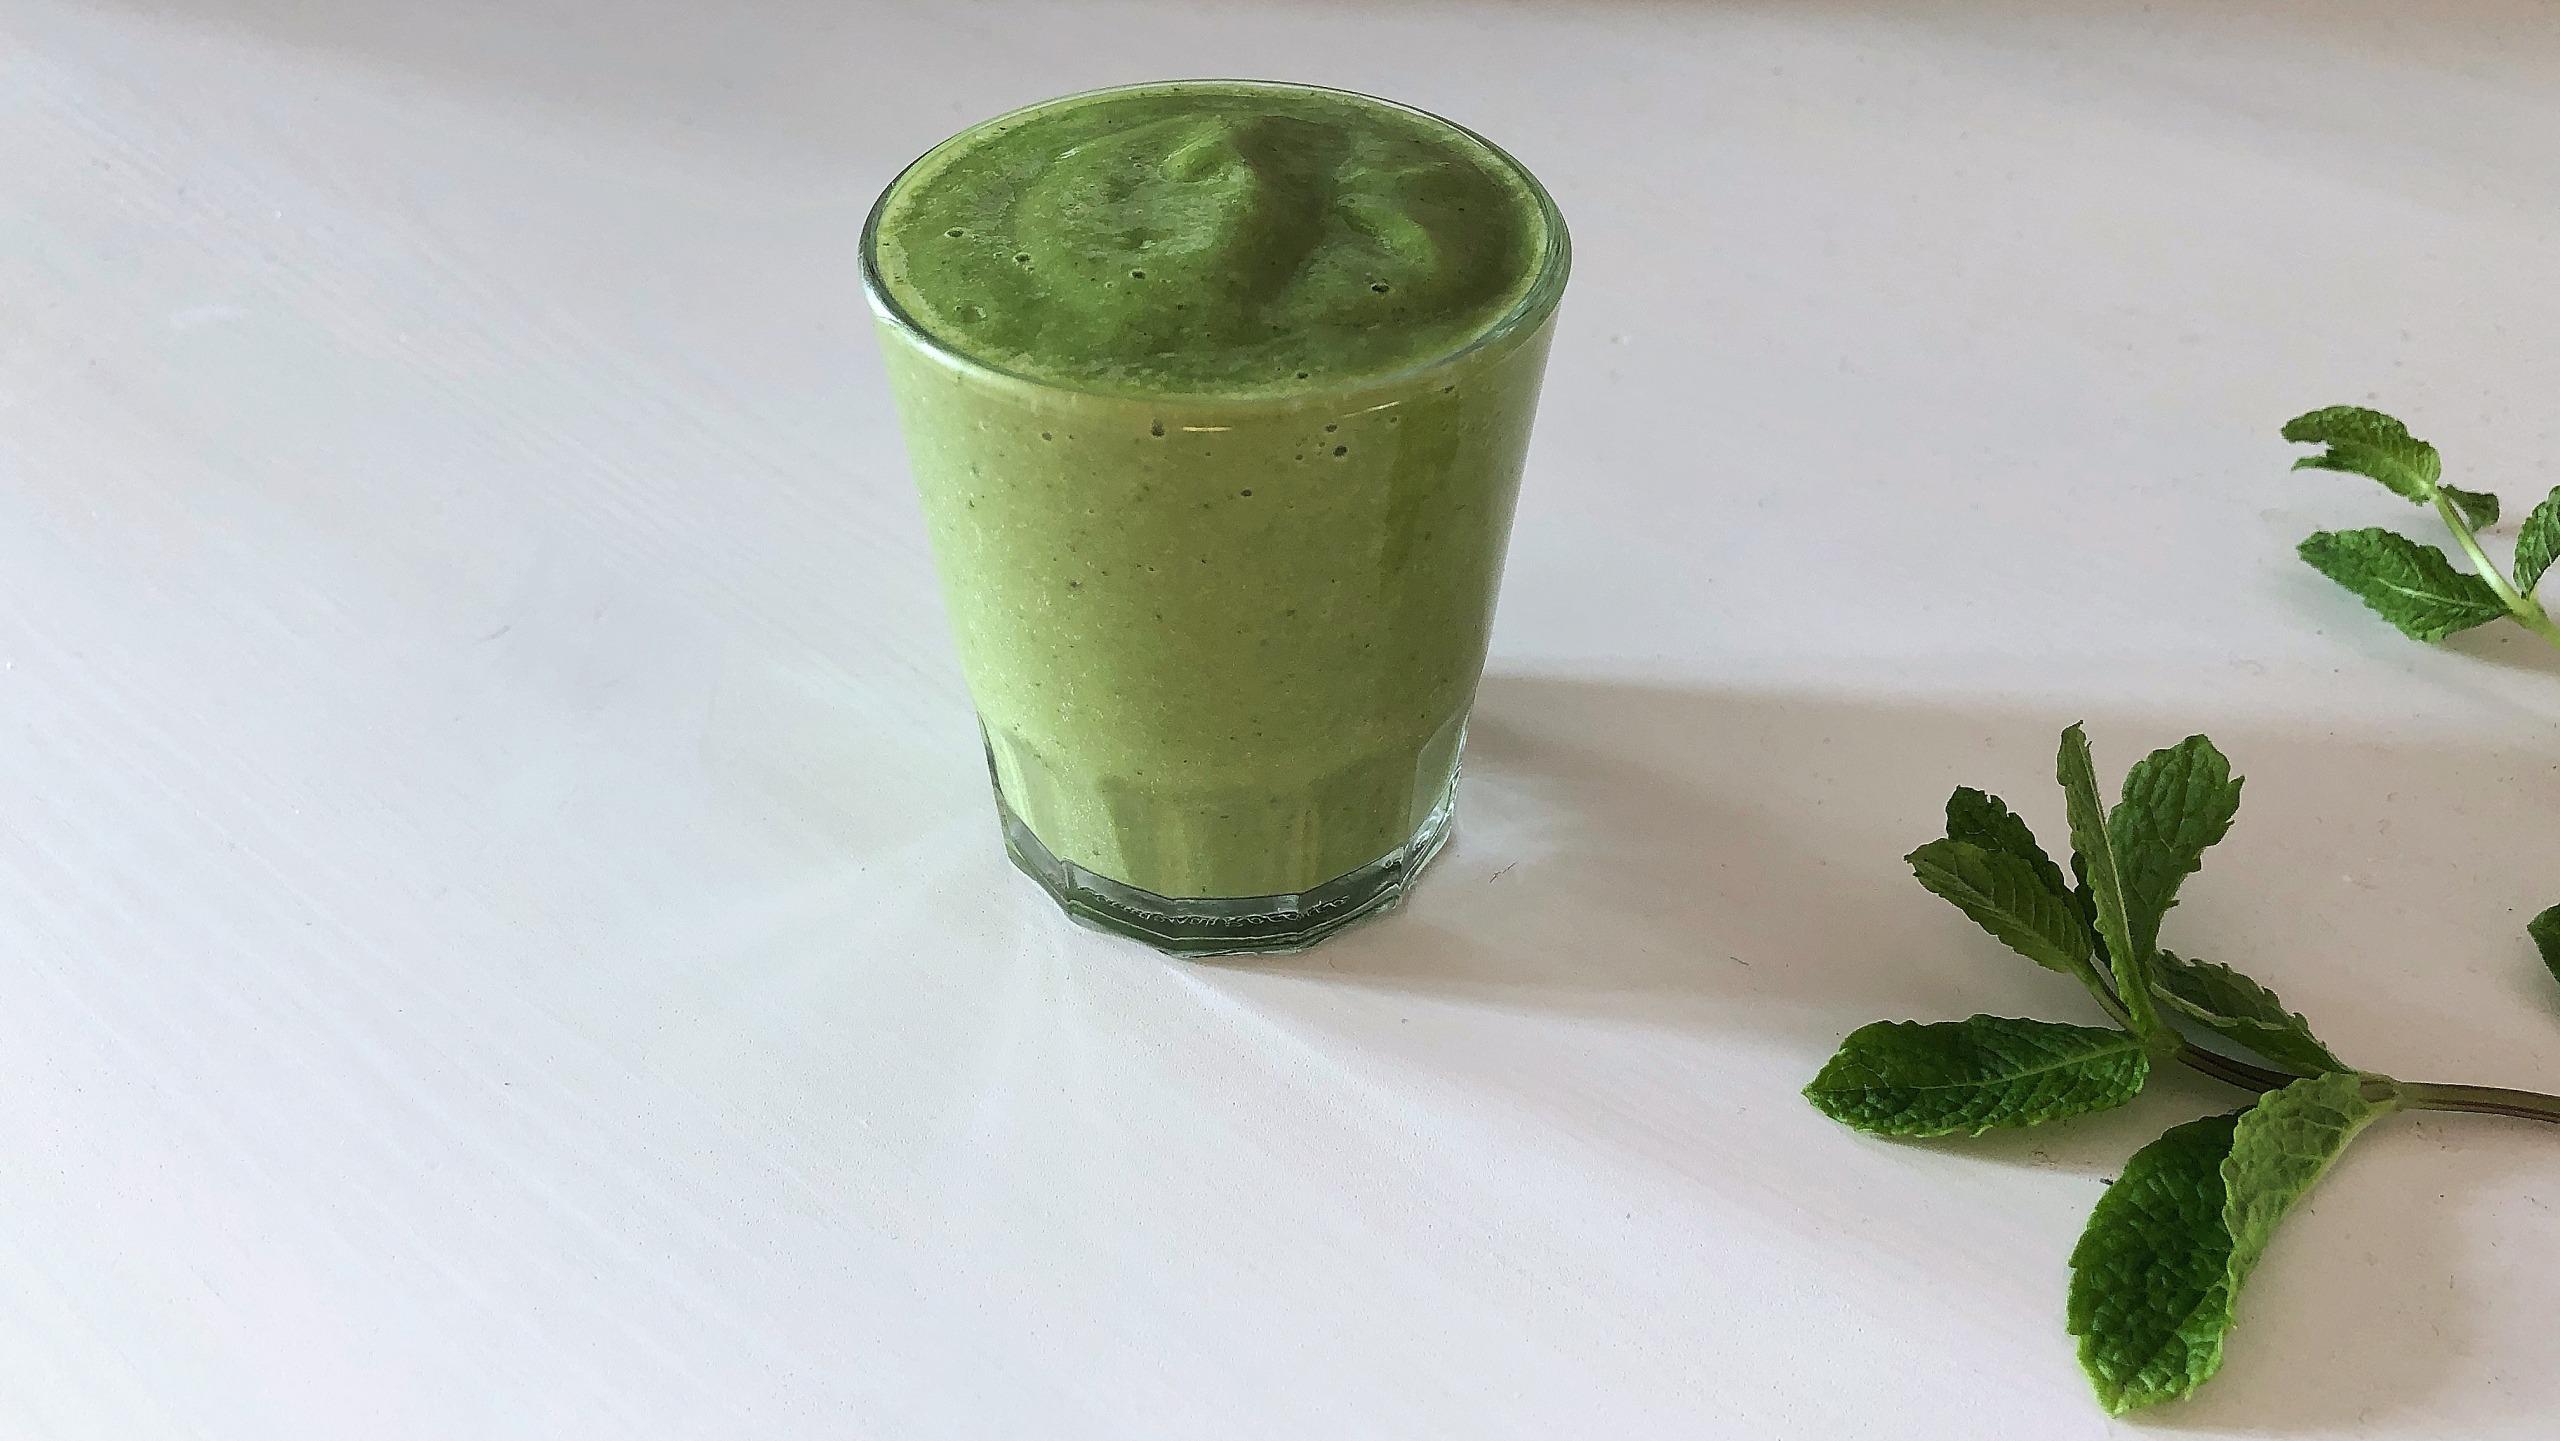 Grüner veganer Smoothie